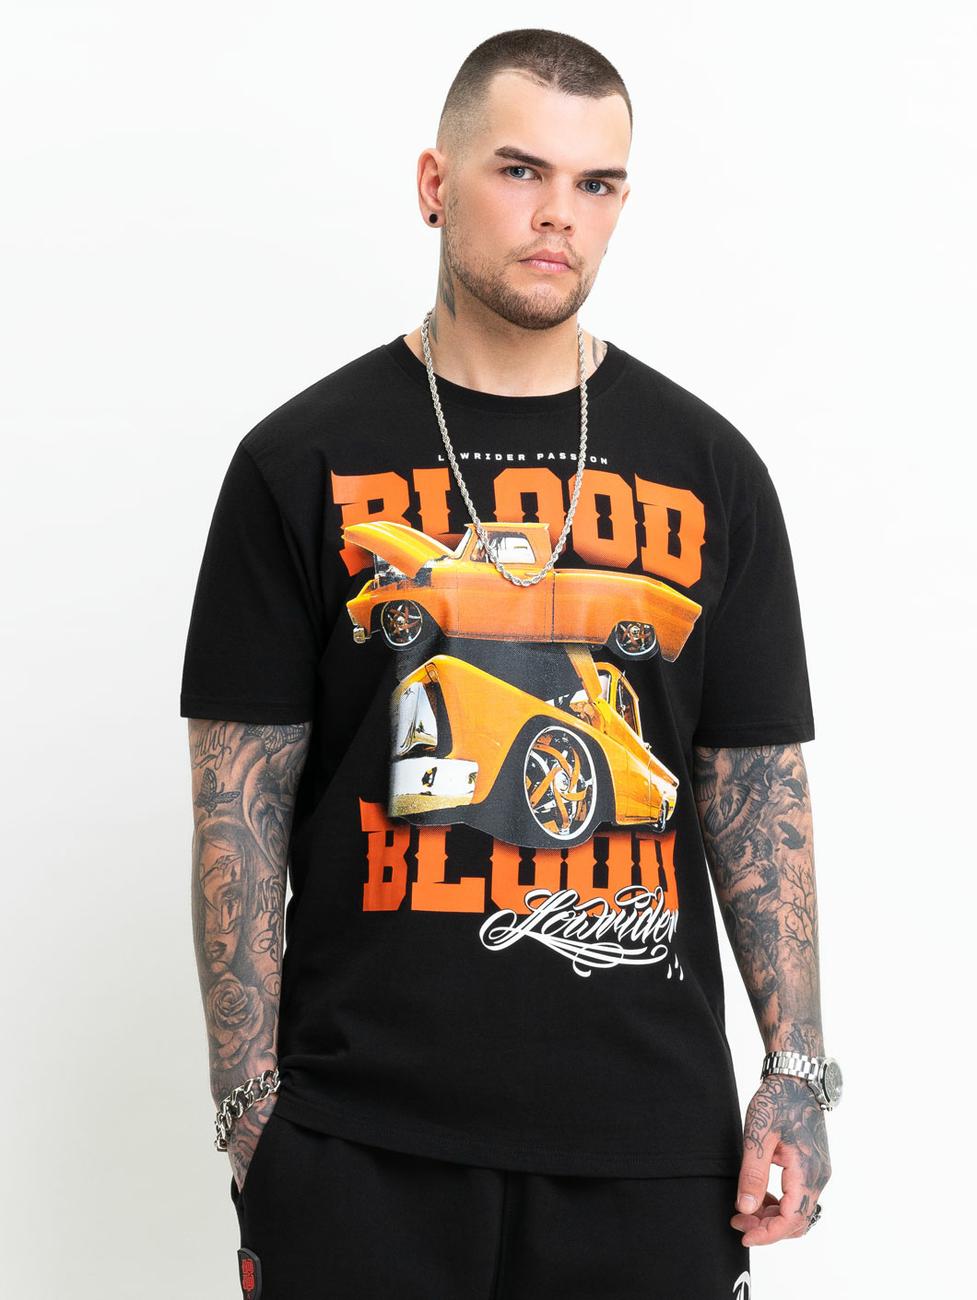 Blood In Blood Out Nizado T-Shirt 3XL